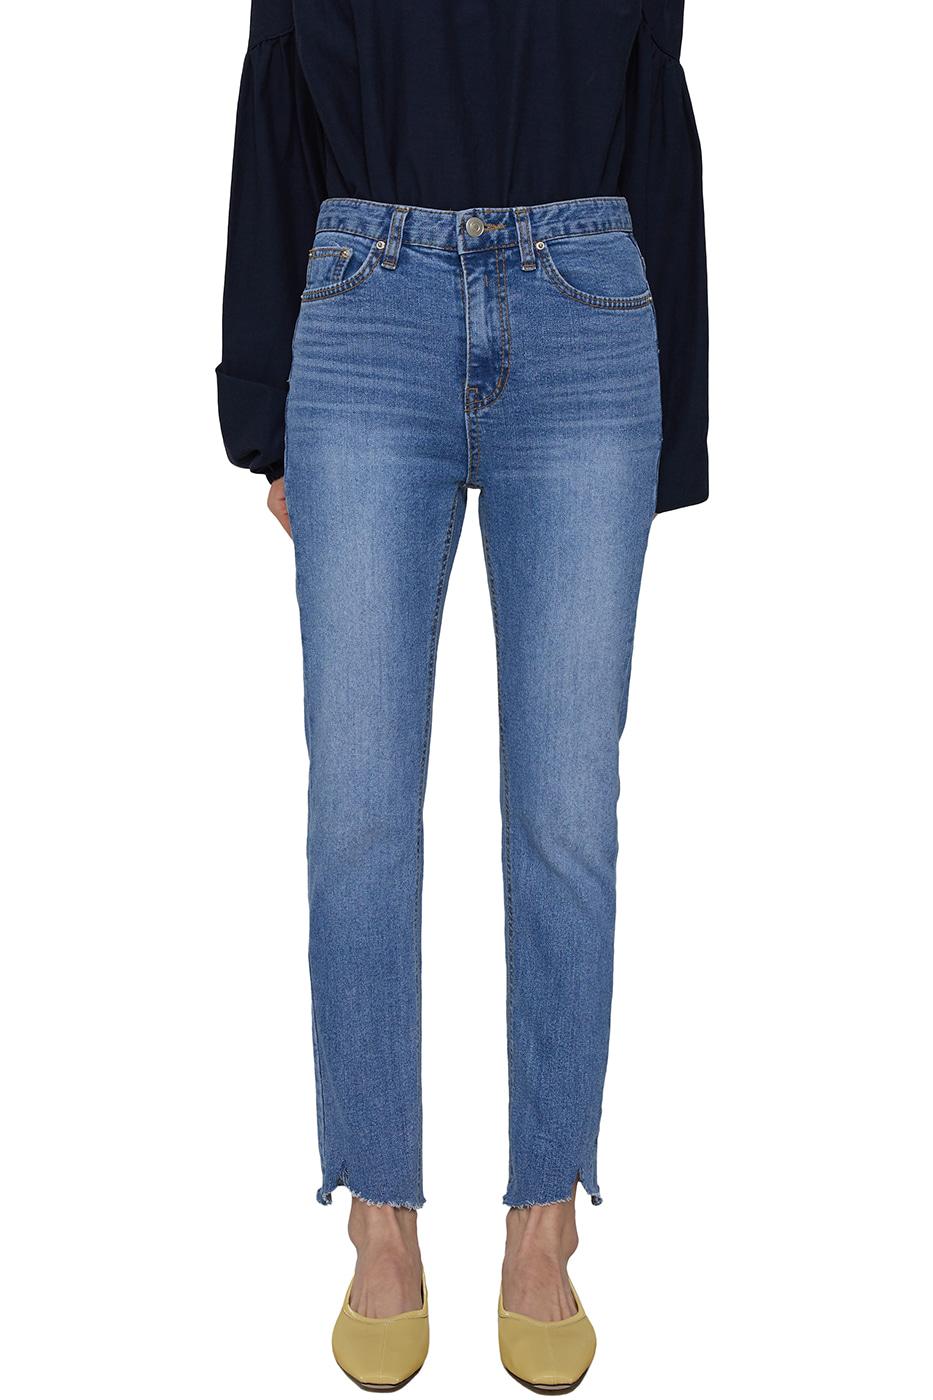 Lazy cut skinny jeans